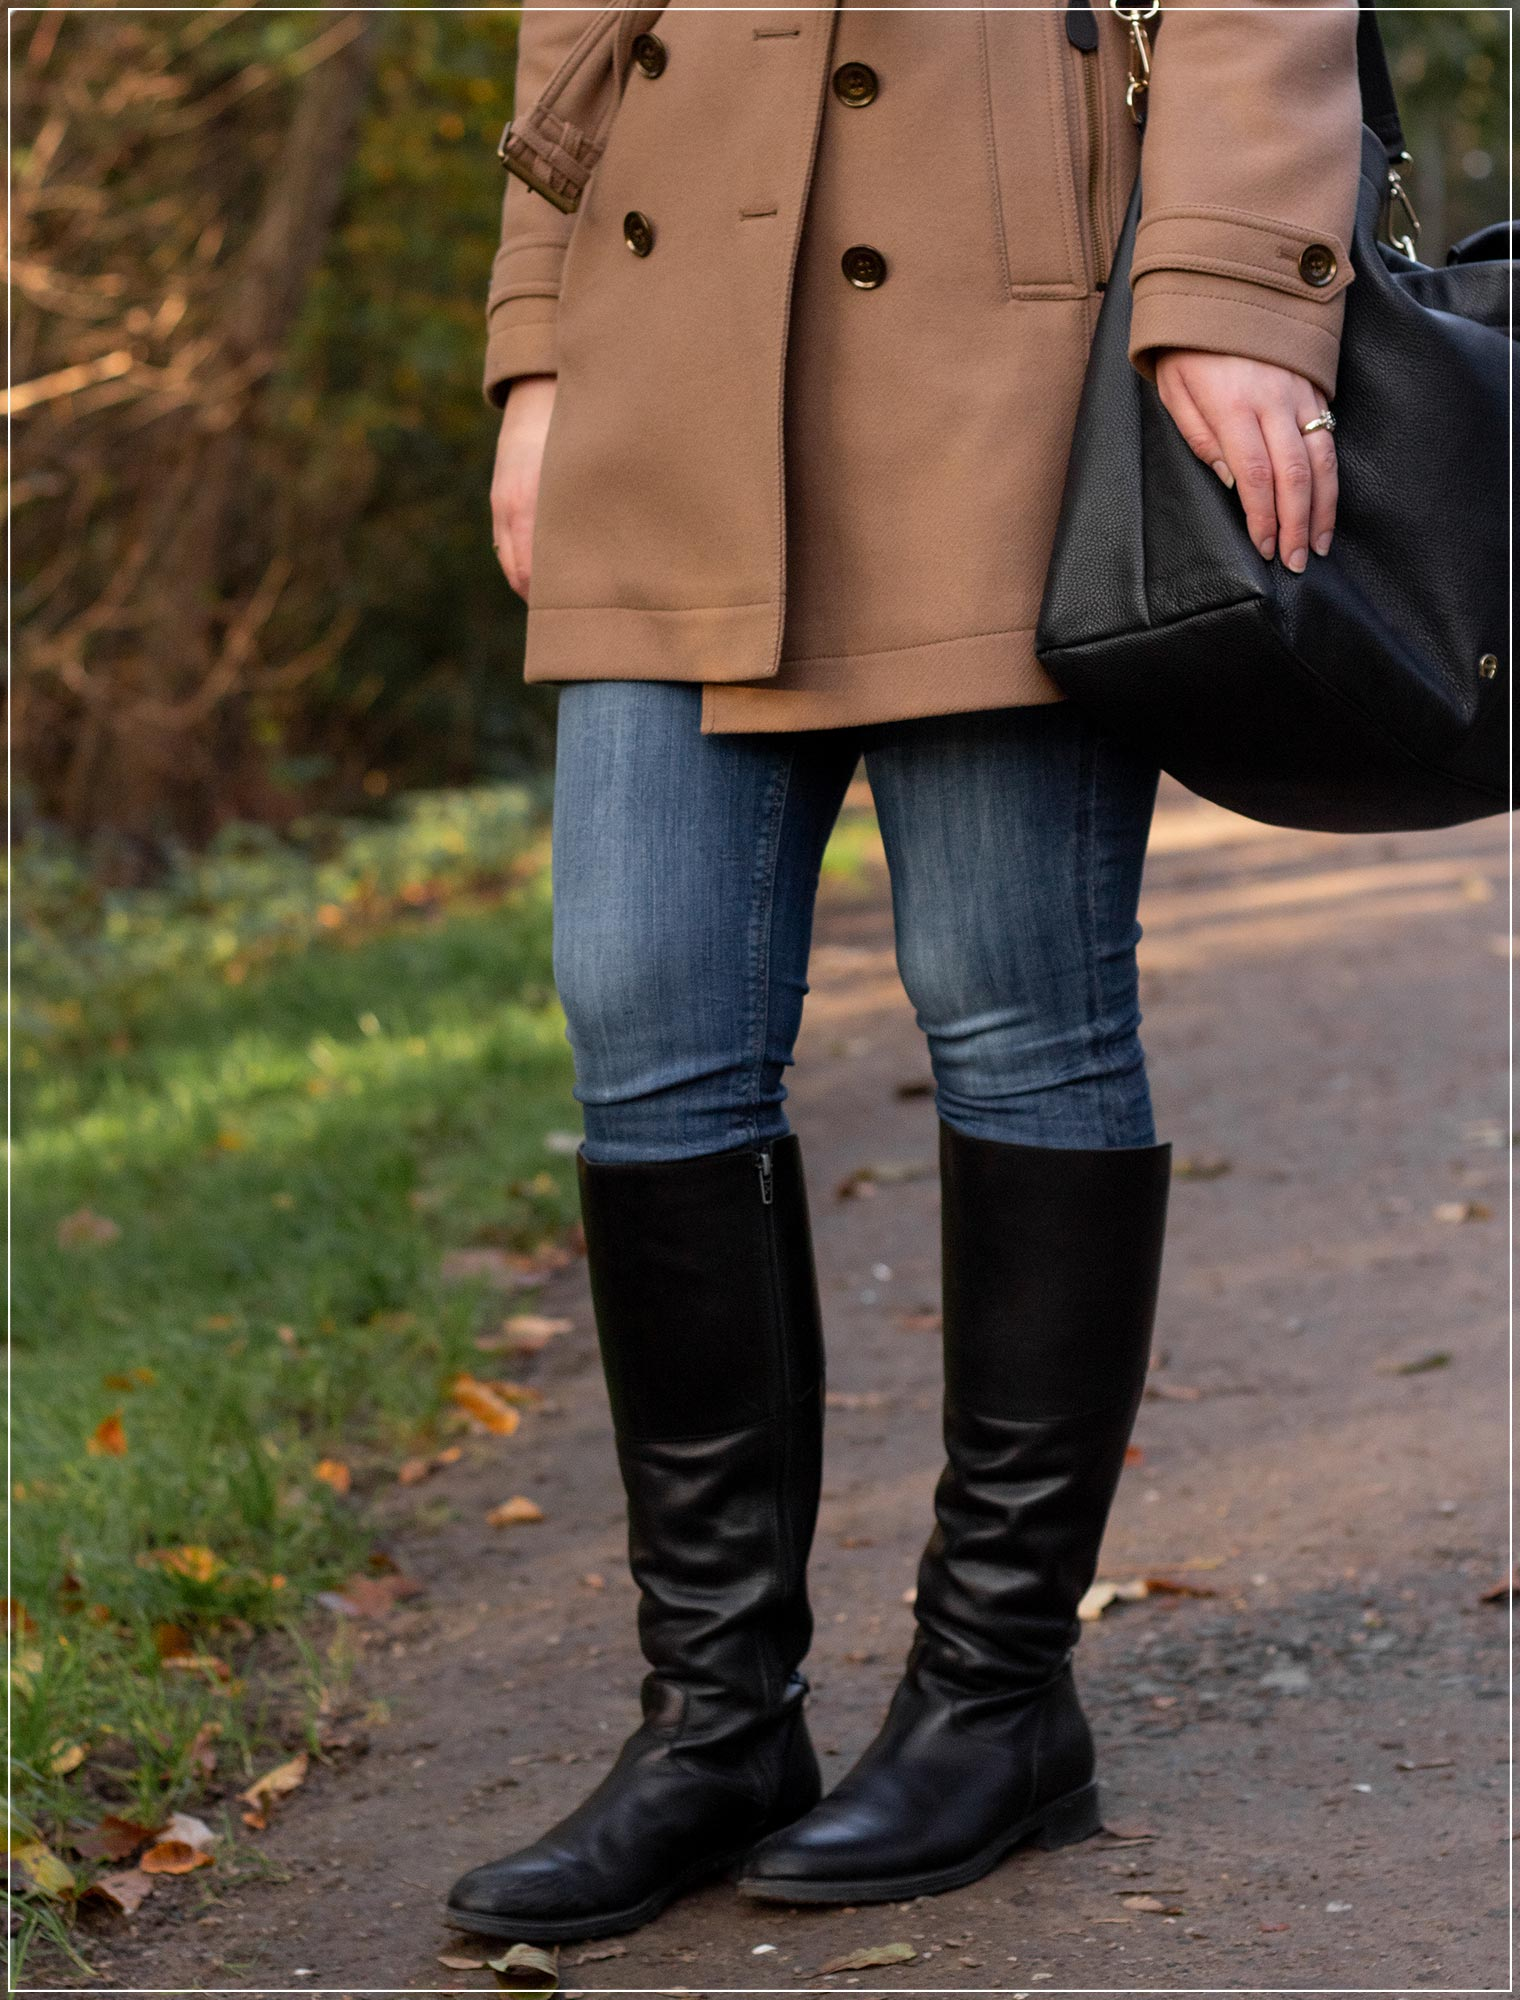 Wollmantel in Kombination mit Jeans